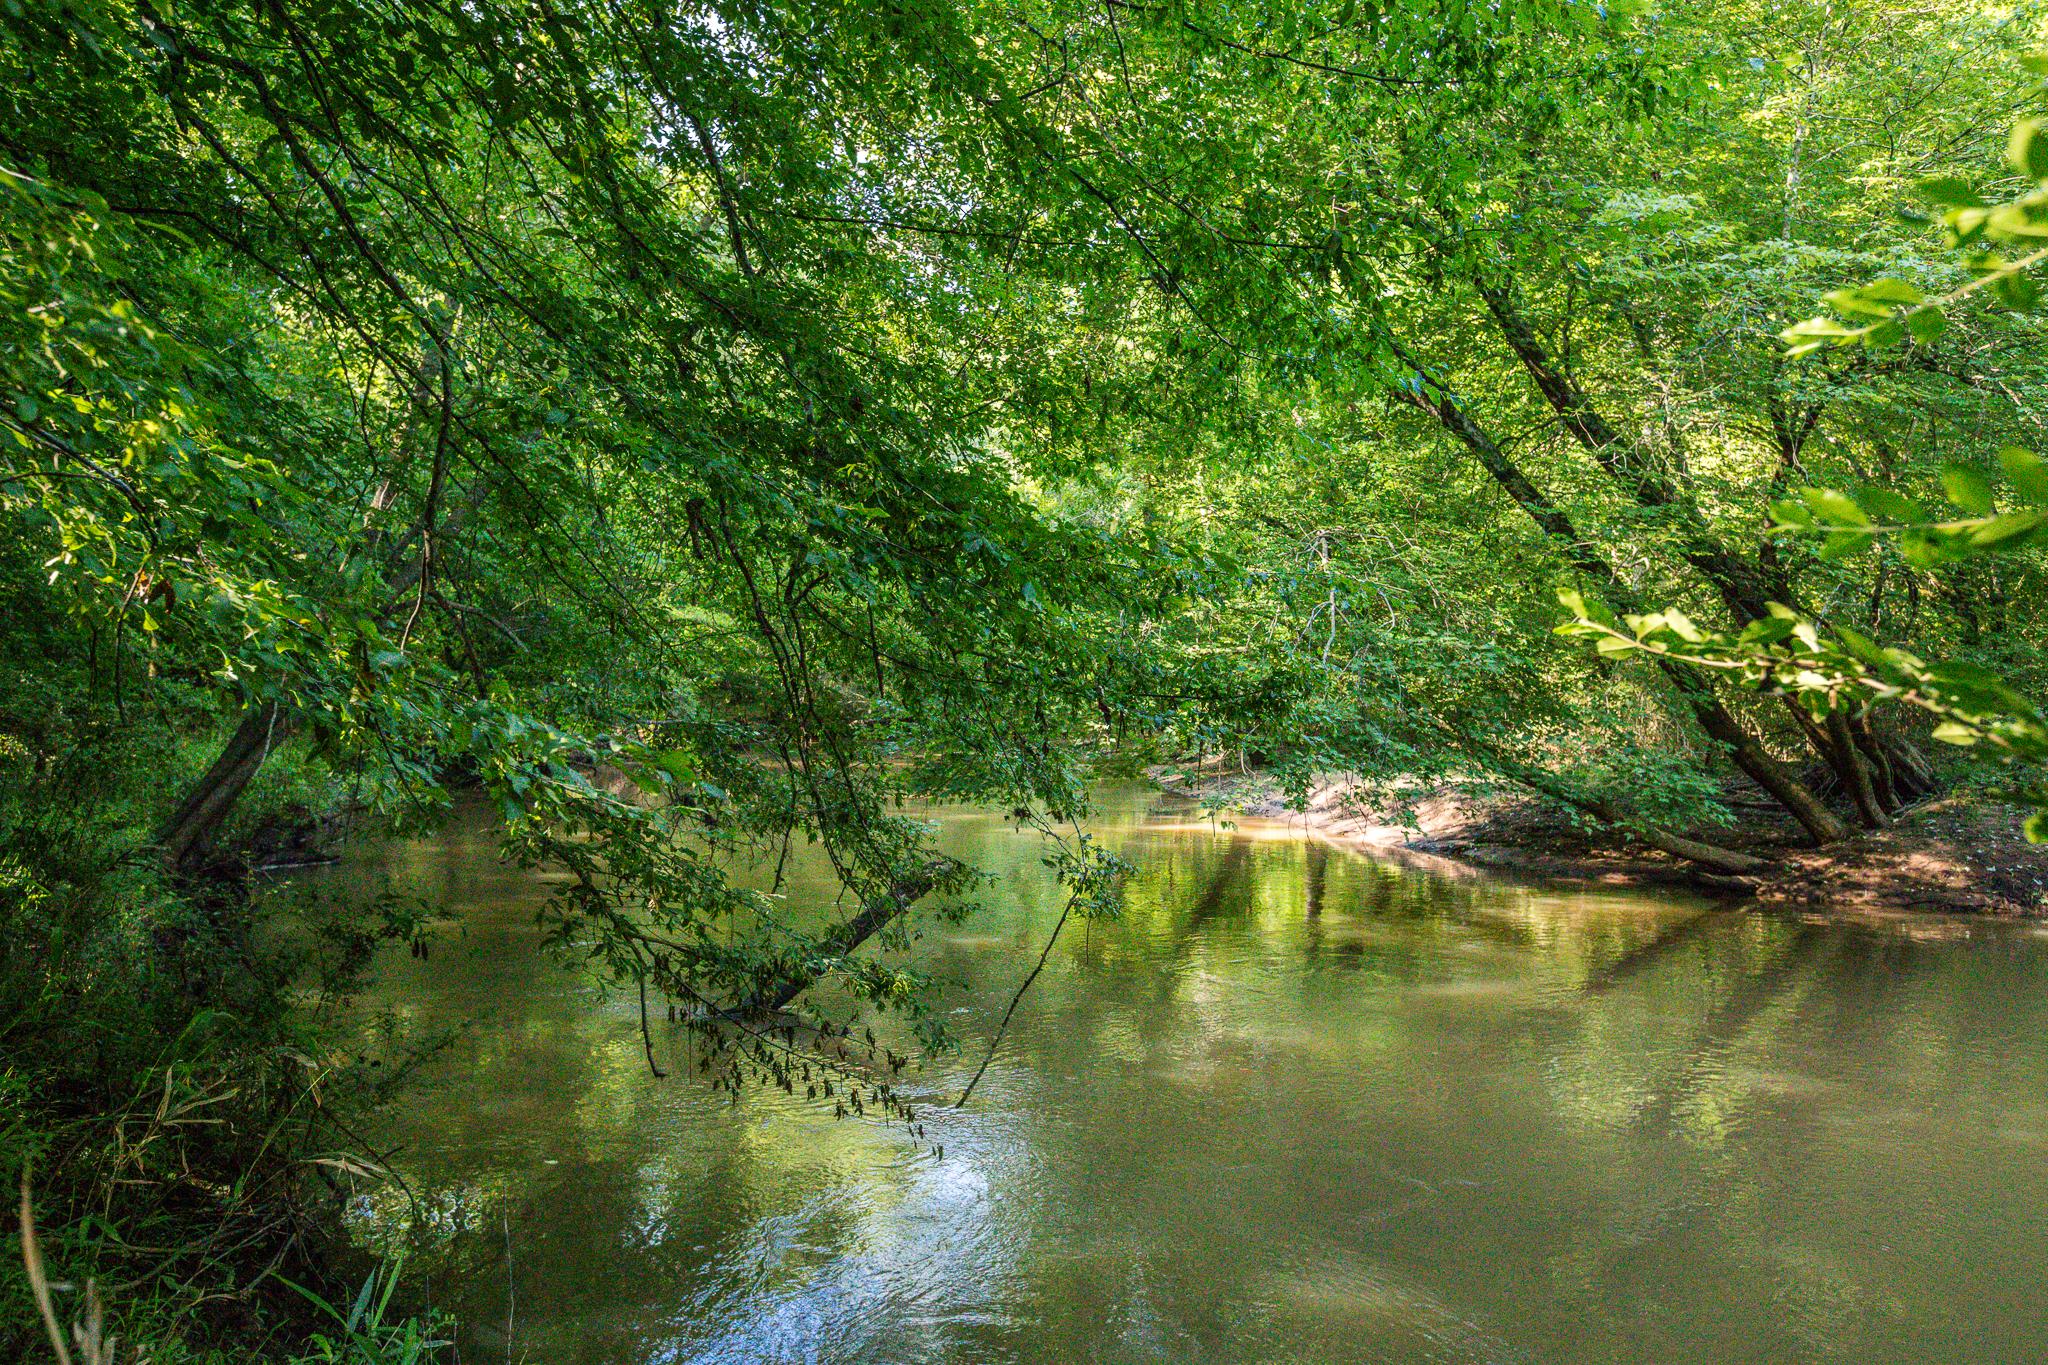 283 Old Starrsville Rd, Covington, Georgia 30014-21.jpg